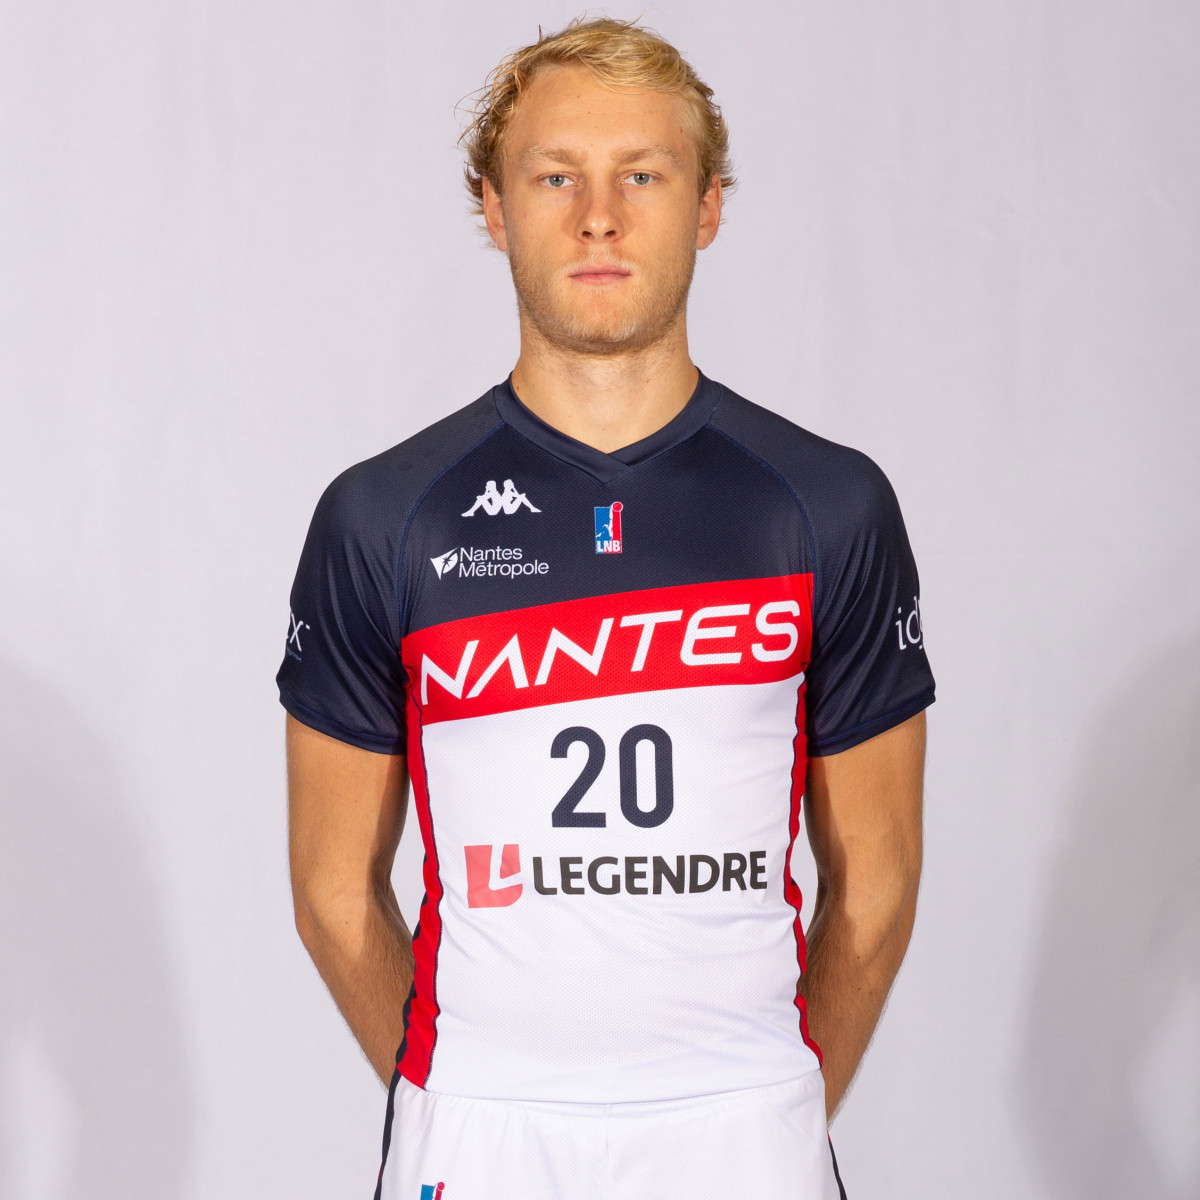 Photo of Thibault Desseignet, 2019-2020 season